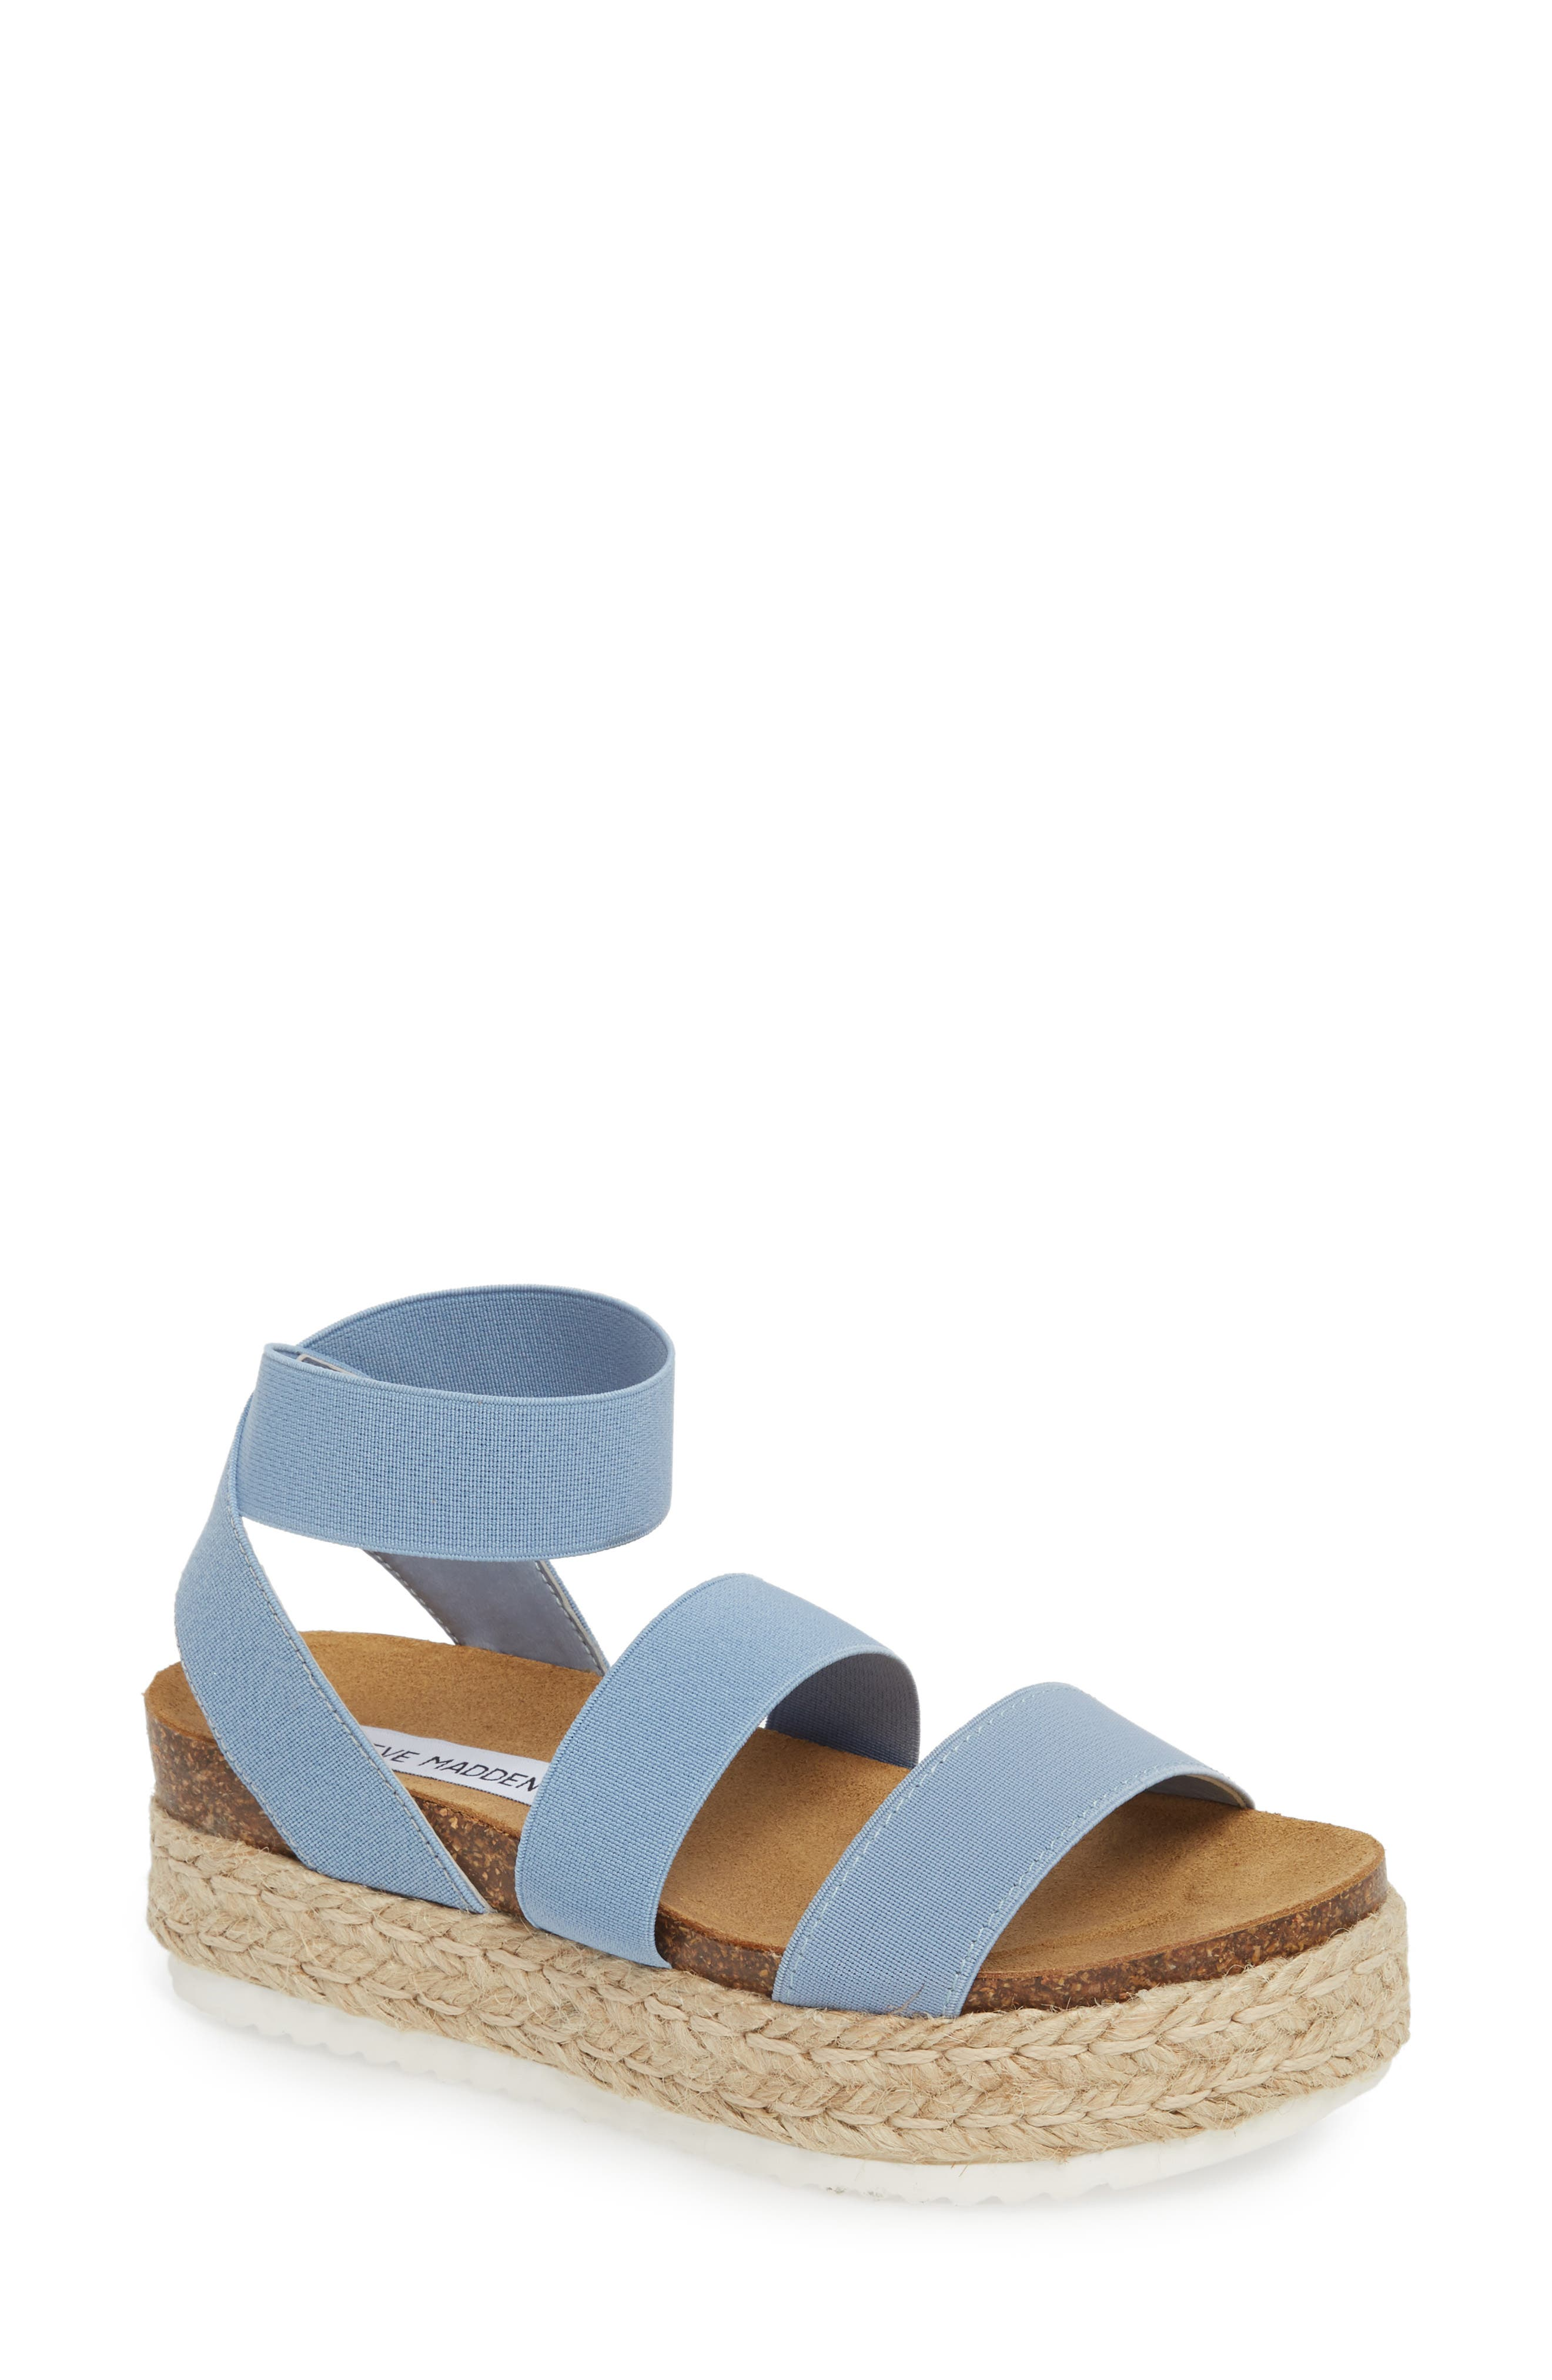 Kimmie Flatform Sandal,                         Main,                         color, Blue